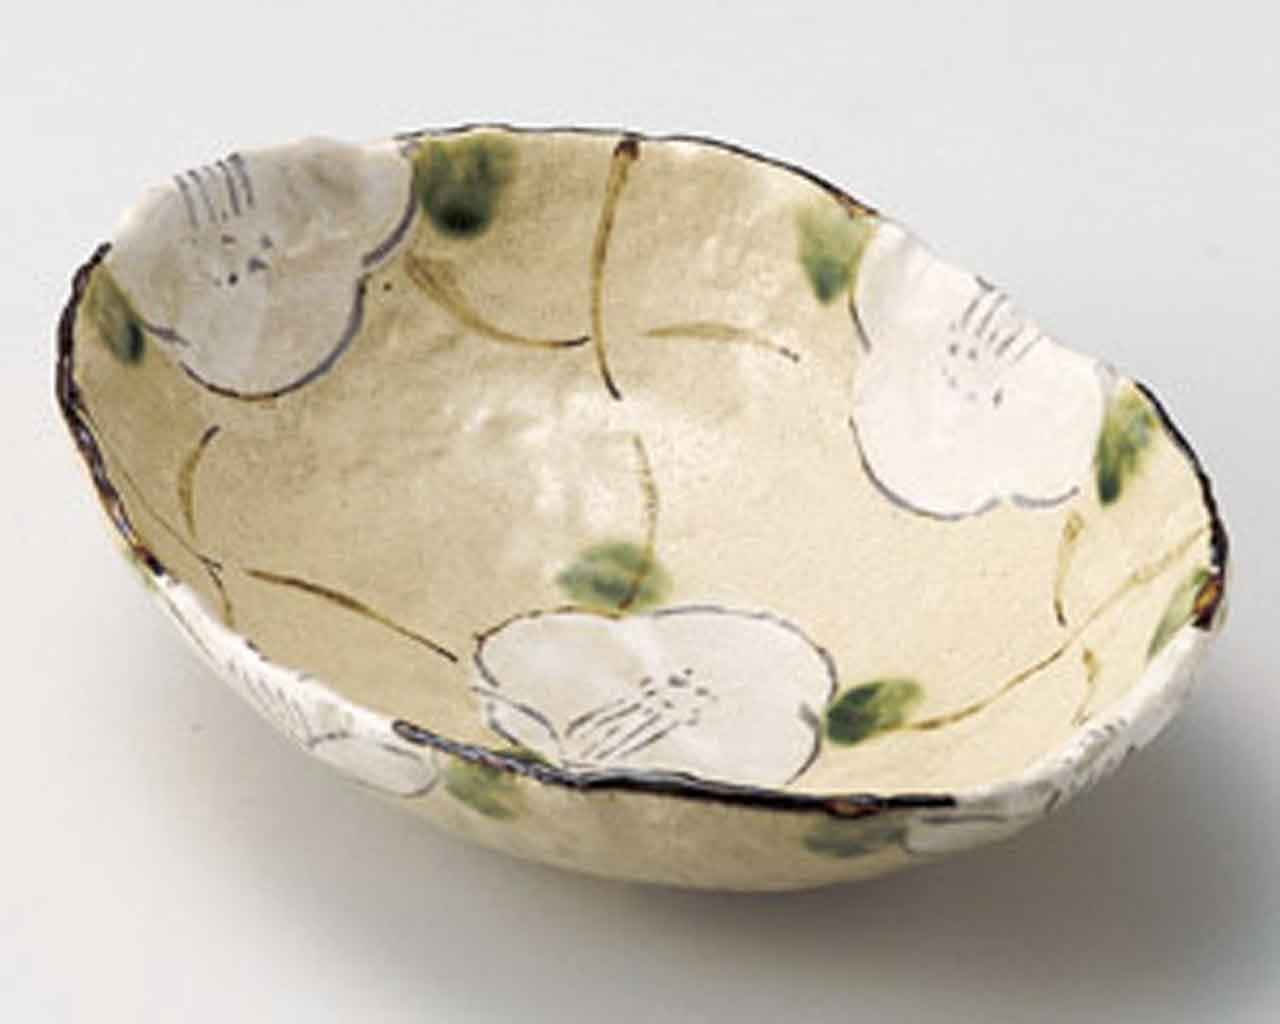 Kohshi Flower 8.4inch Set of 5 Medium Plates Beige Ceramic Made in Japan